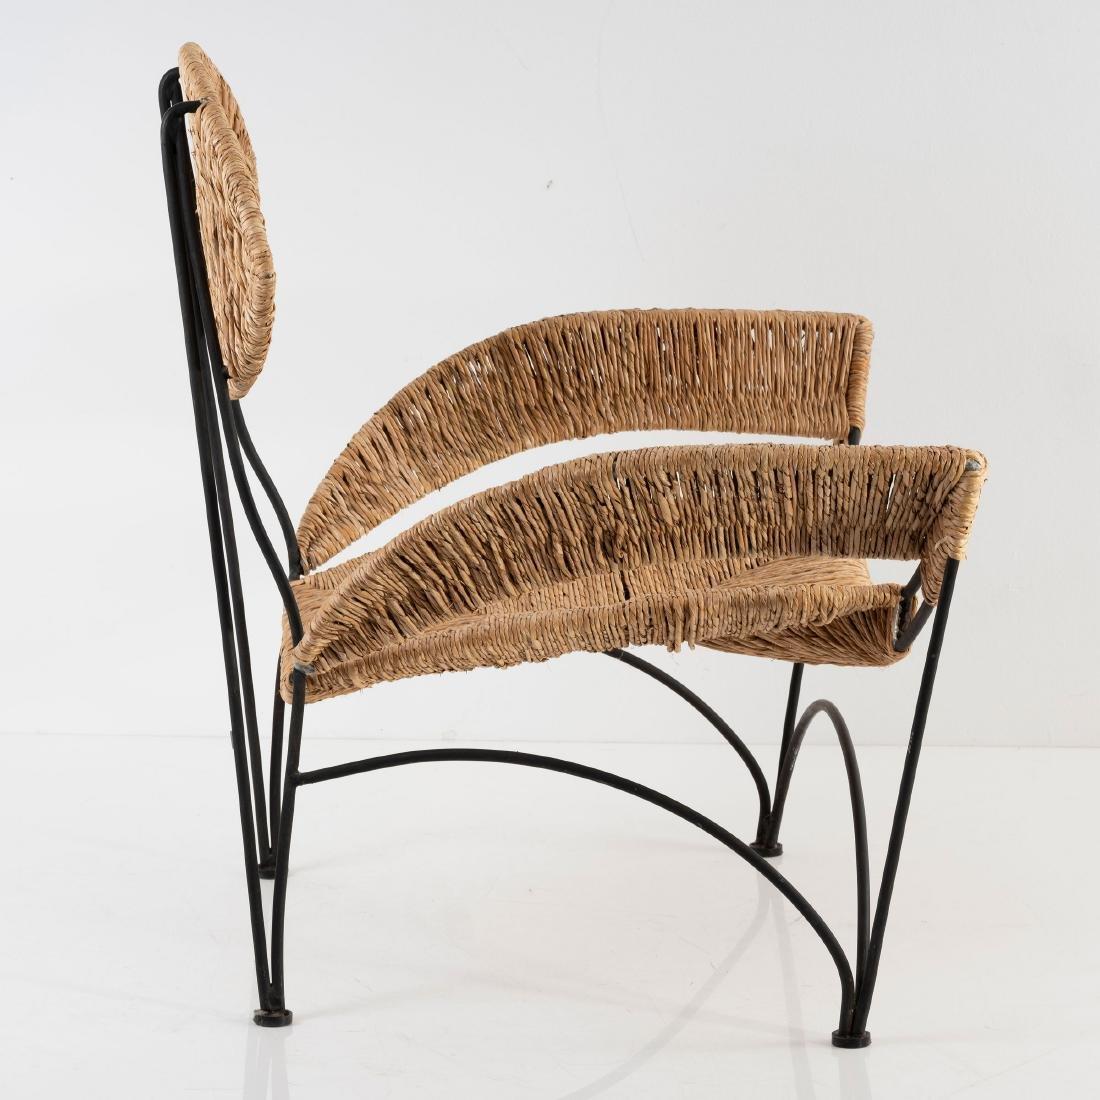 'Banana chair', 1988 - 4